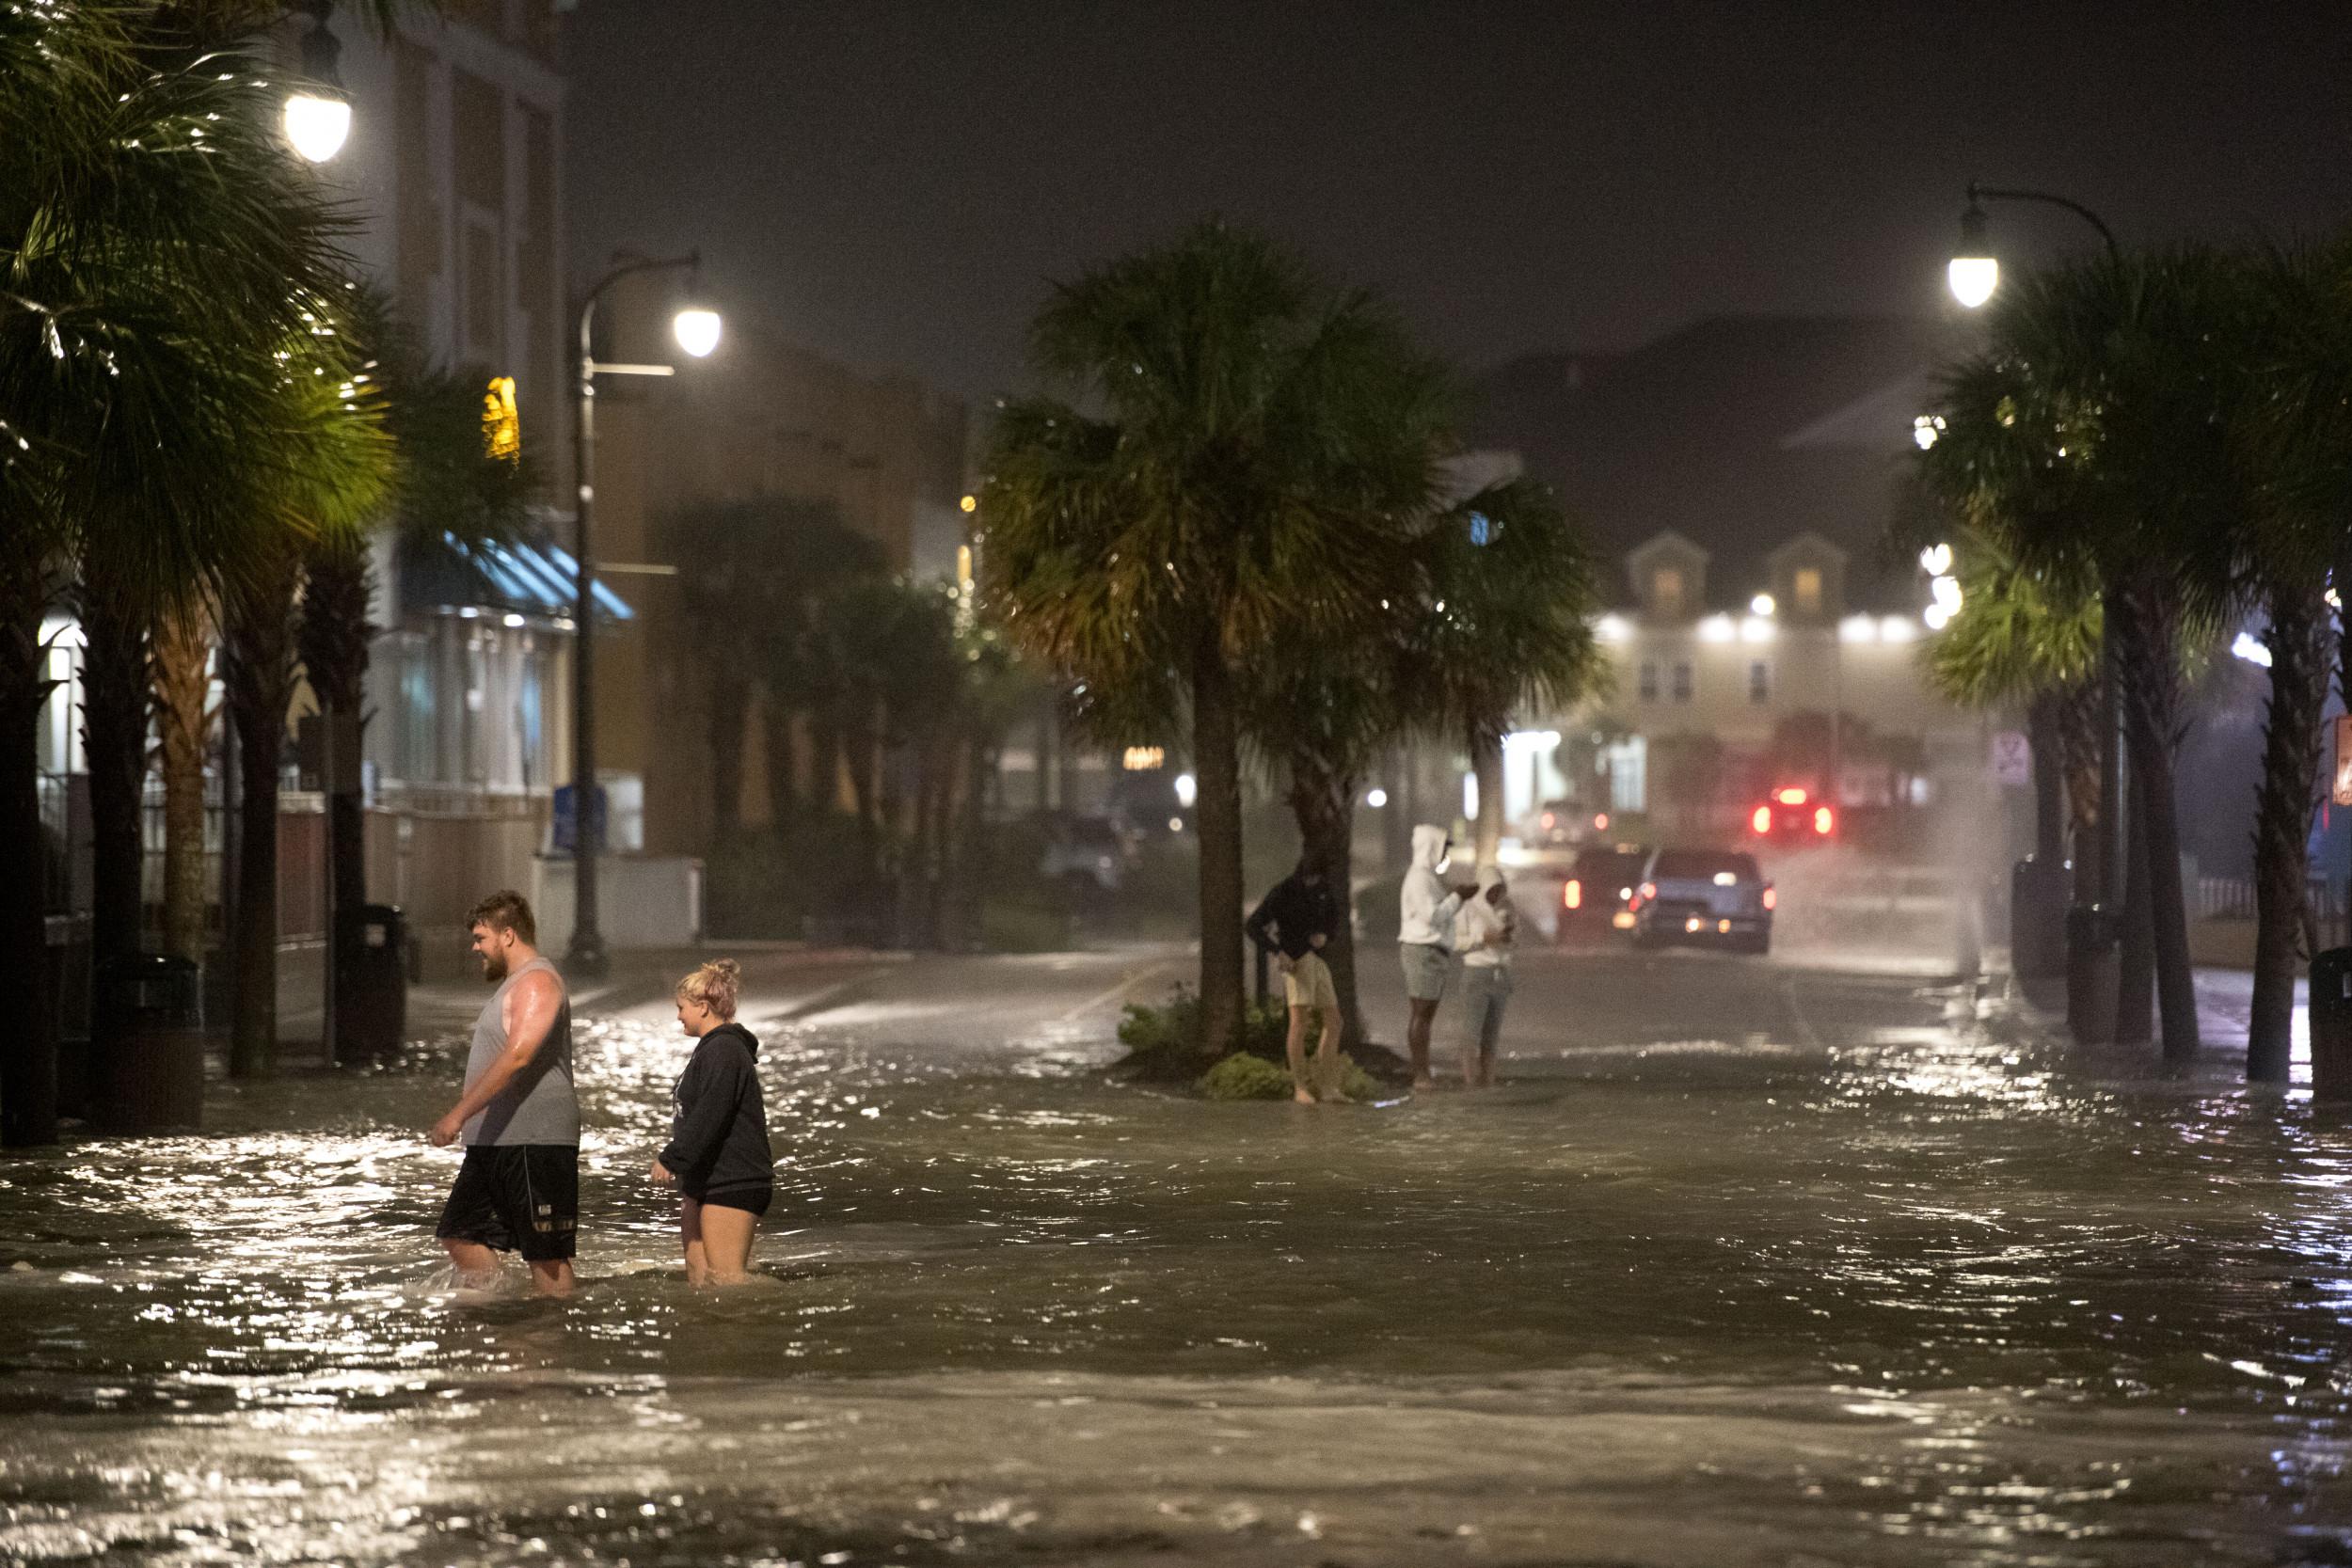 Tropical Storm Isaias photos reveal widespread damage, flooding in Carolinas